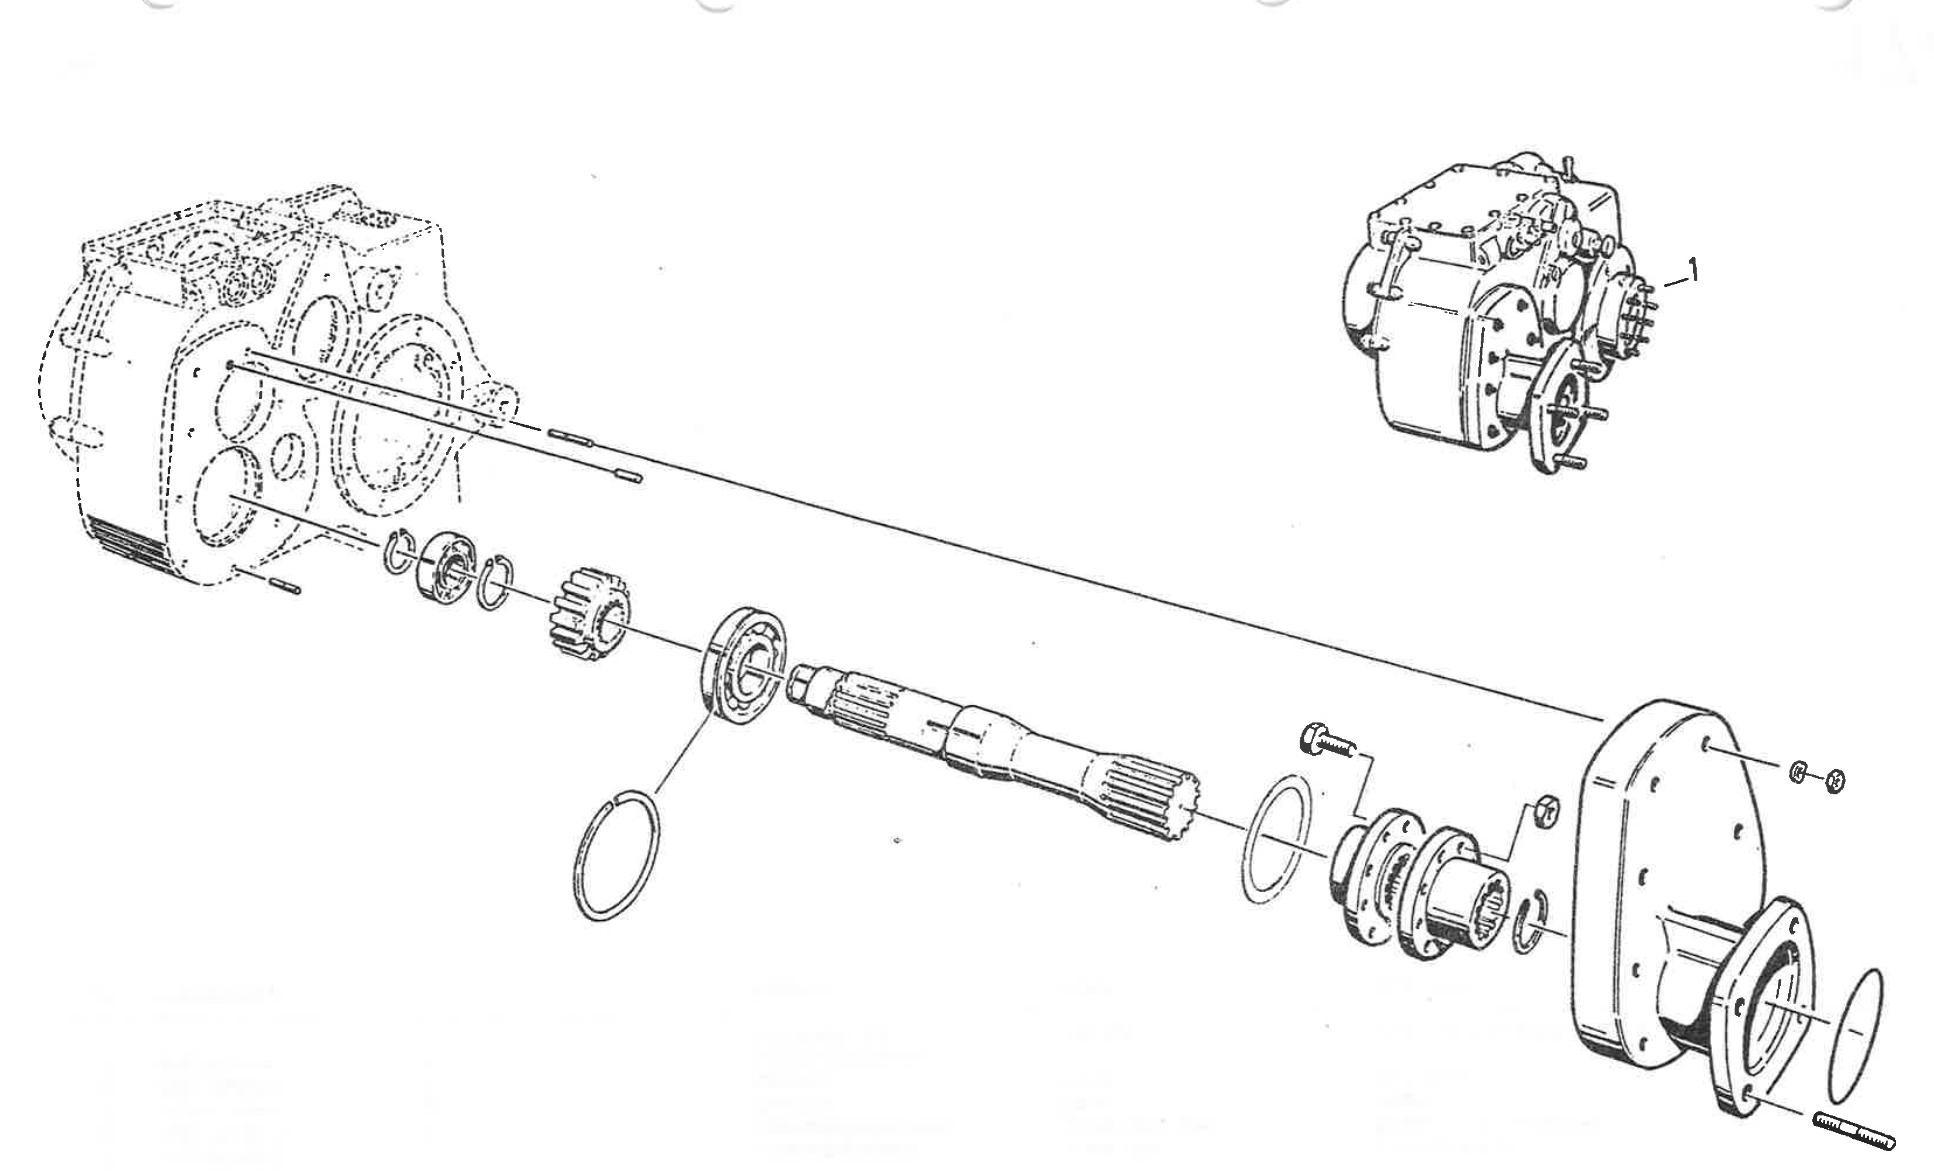 525_1997_173_Stirnradschaltgetriebe_1_Hyfa_wlb